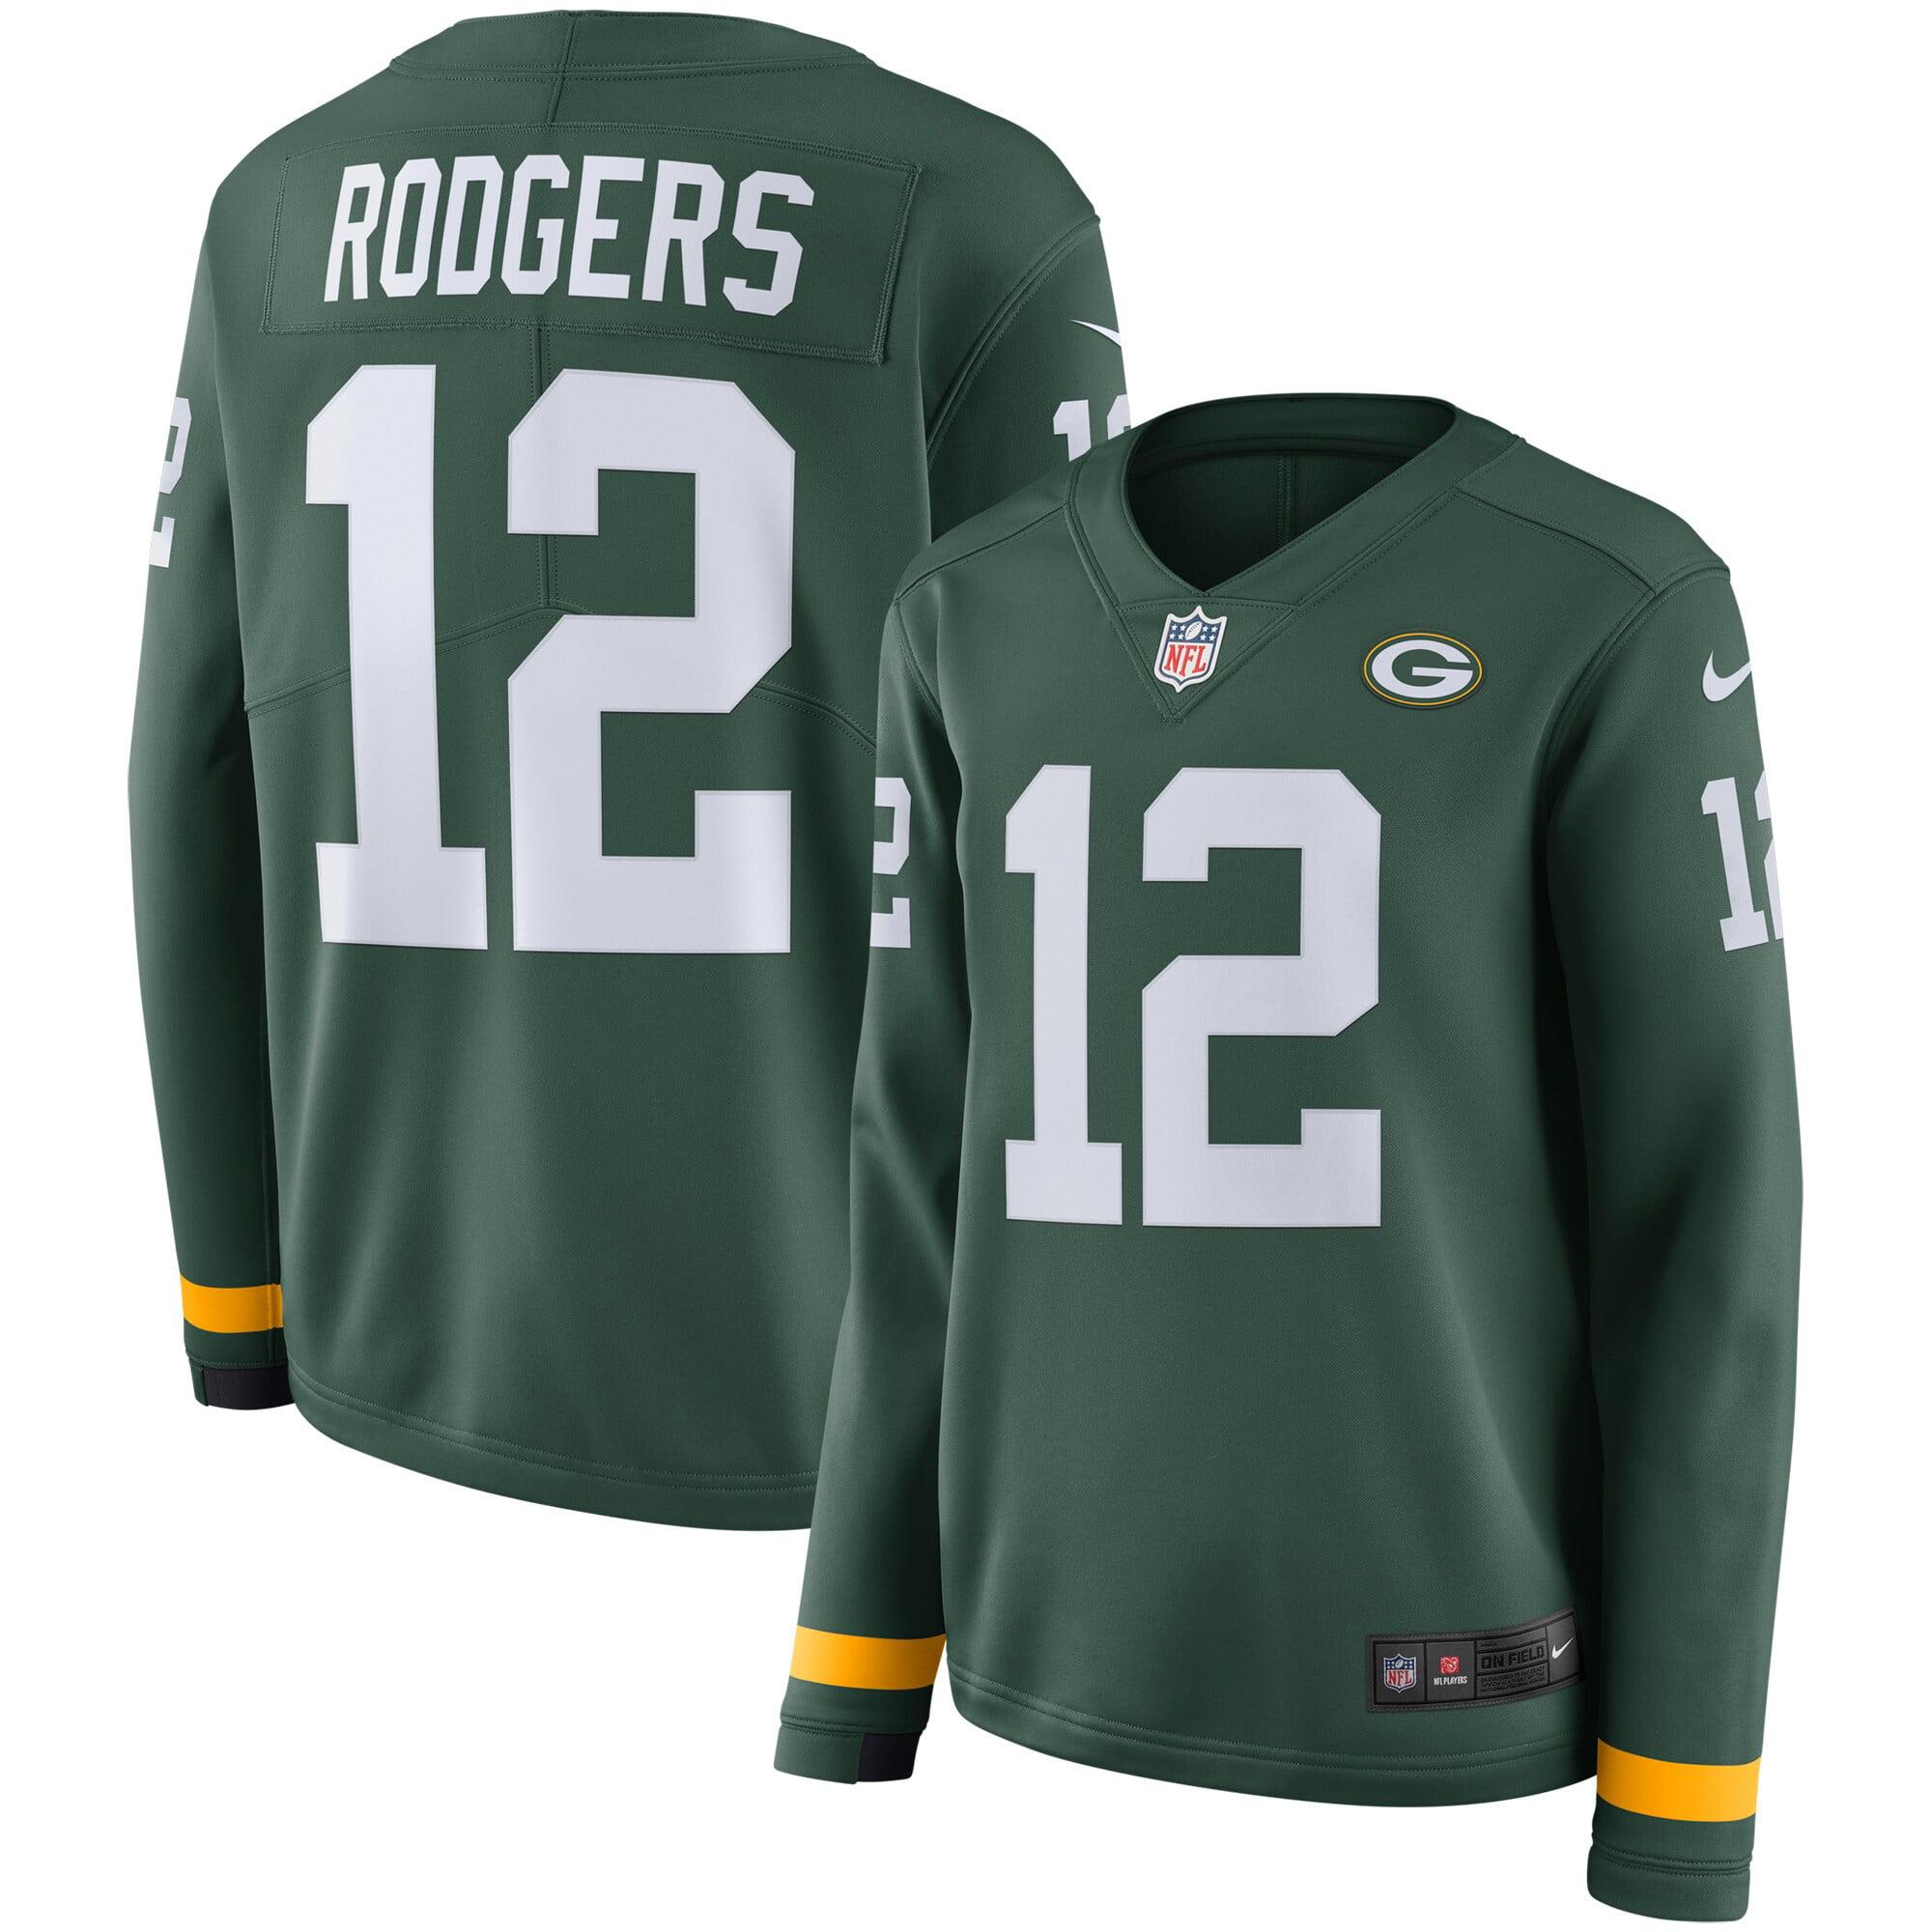 Aaron Rodgers Green Bay Packers Nike Women's Therma Long Sleeve Jersey - Green - Walmart.com